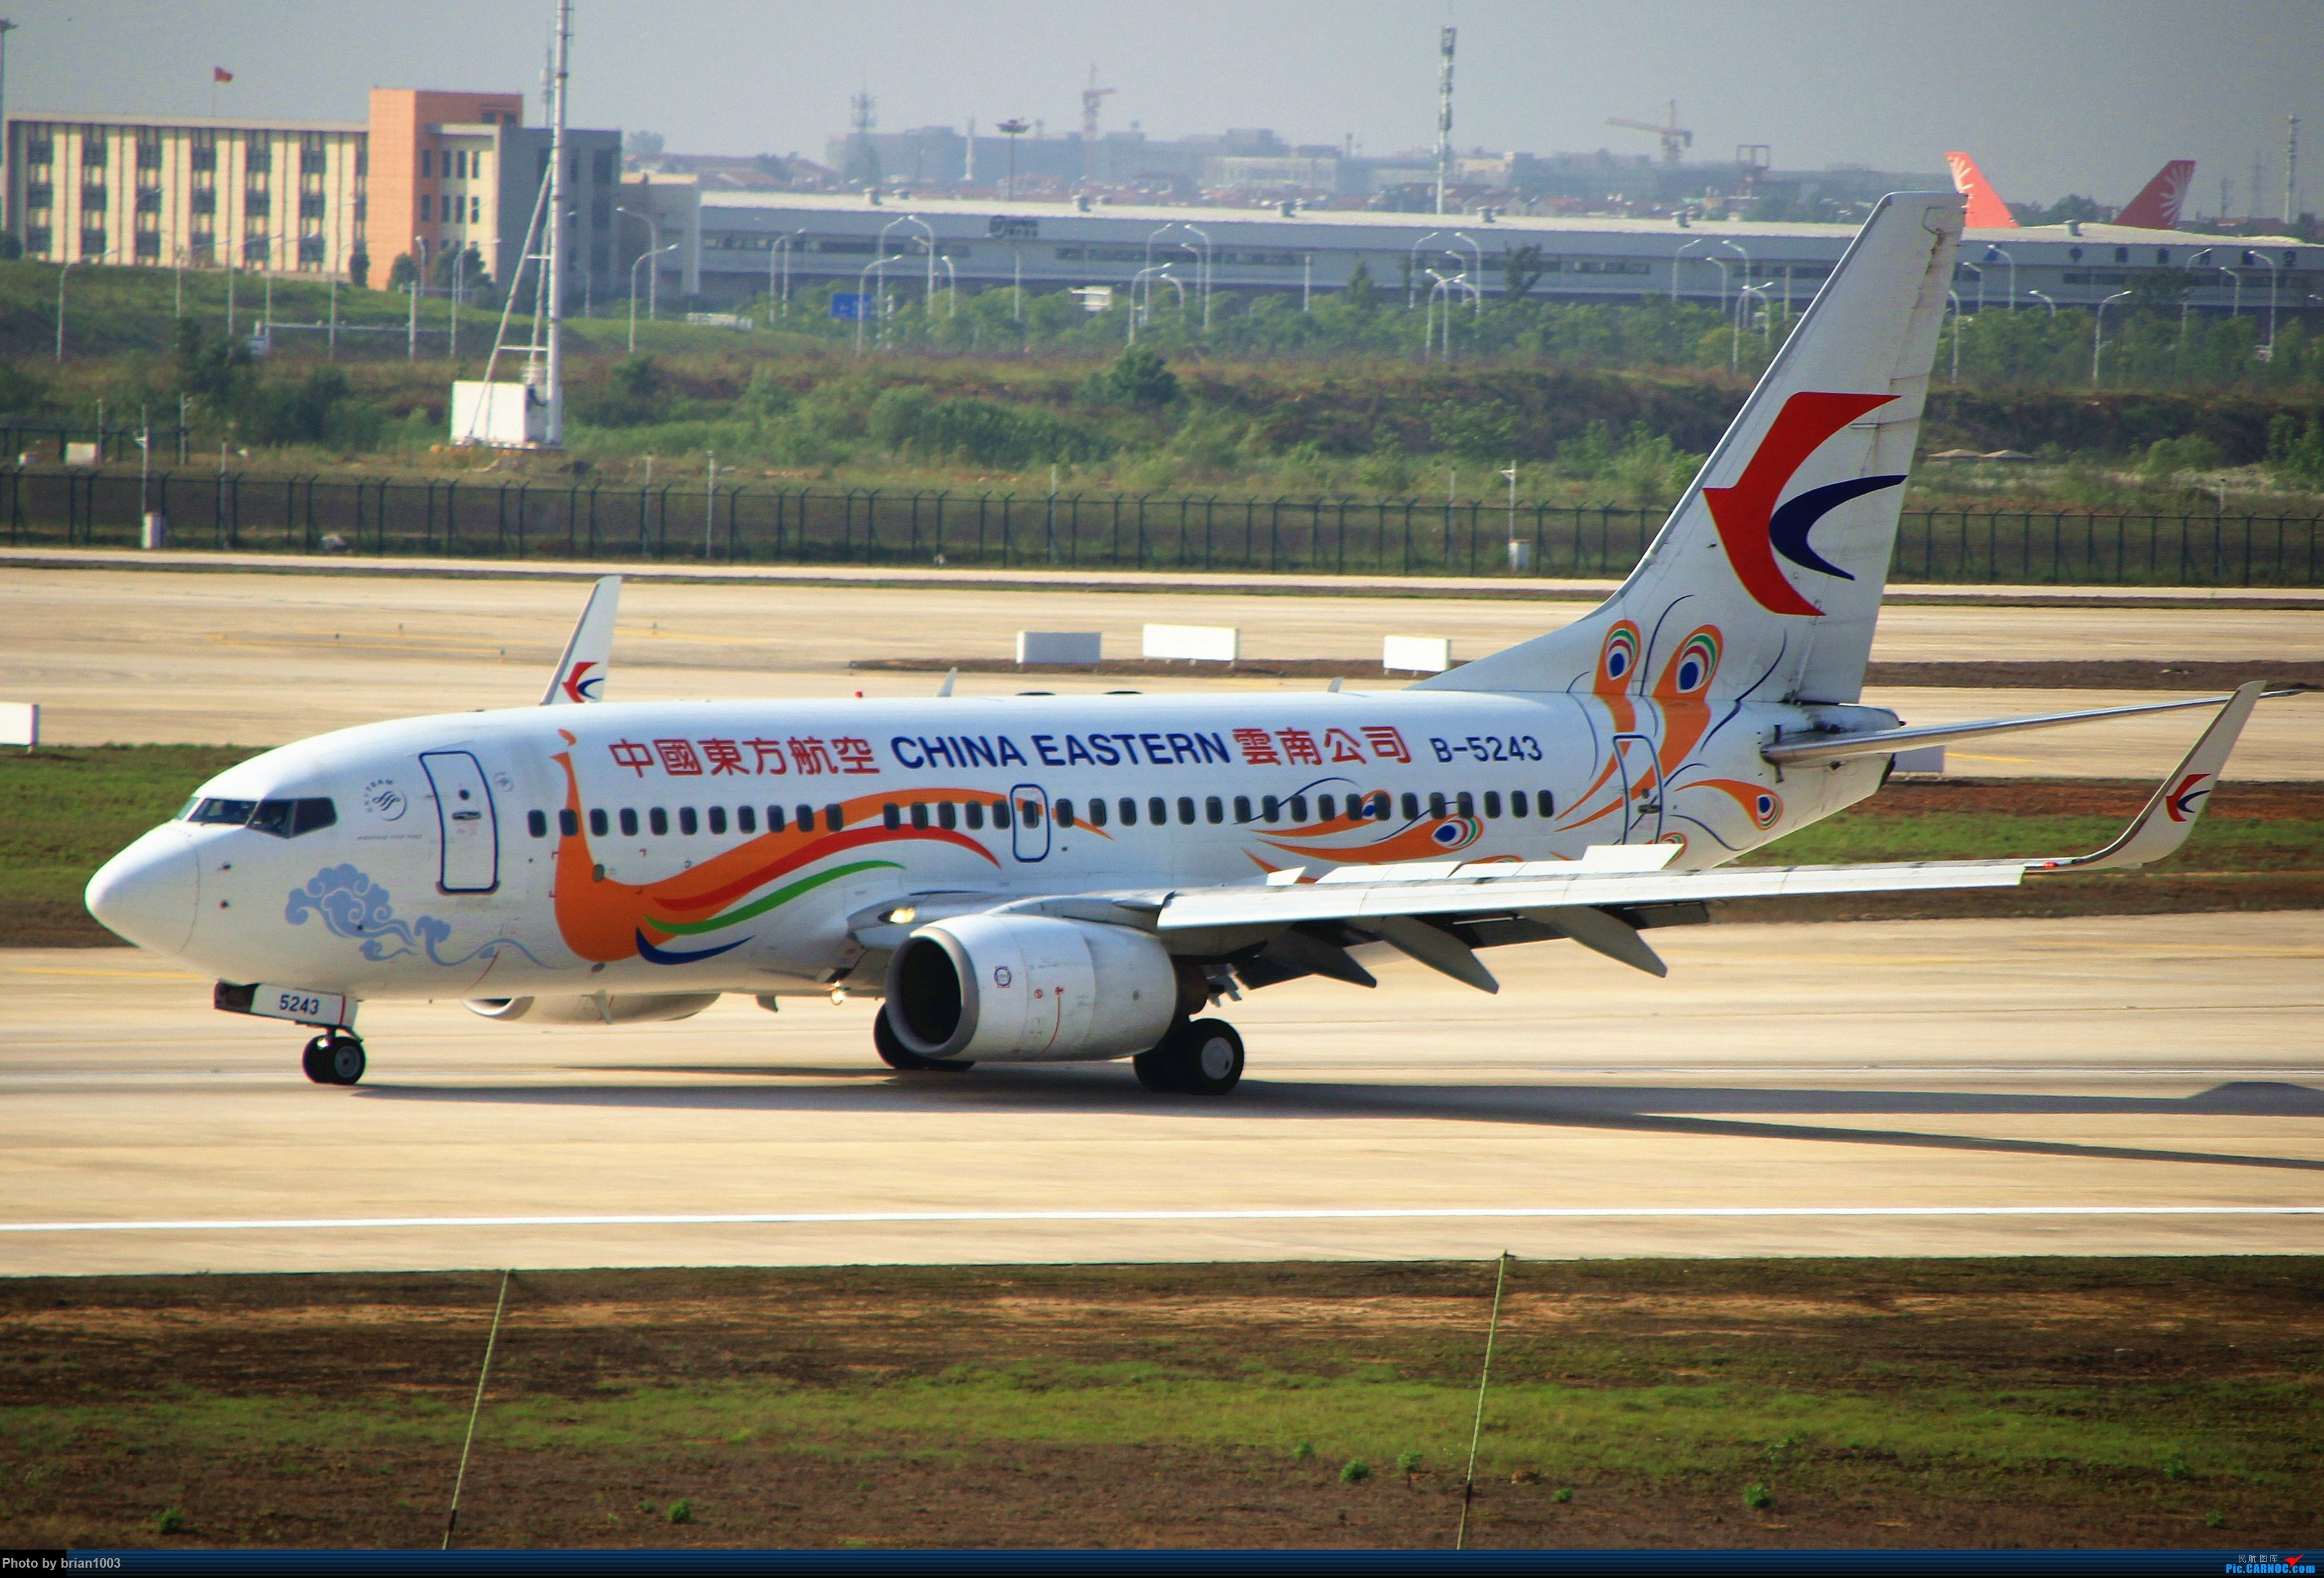 Re:[原创]WUH武汉天河机场拍机之喜迎酷航788和偶遇某其他飞机 BOEING 737-700 B-5243